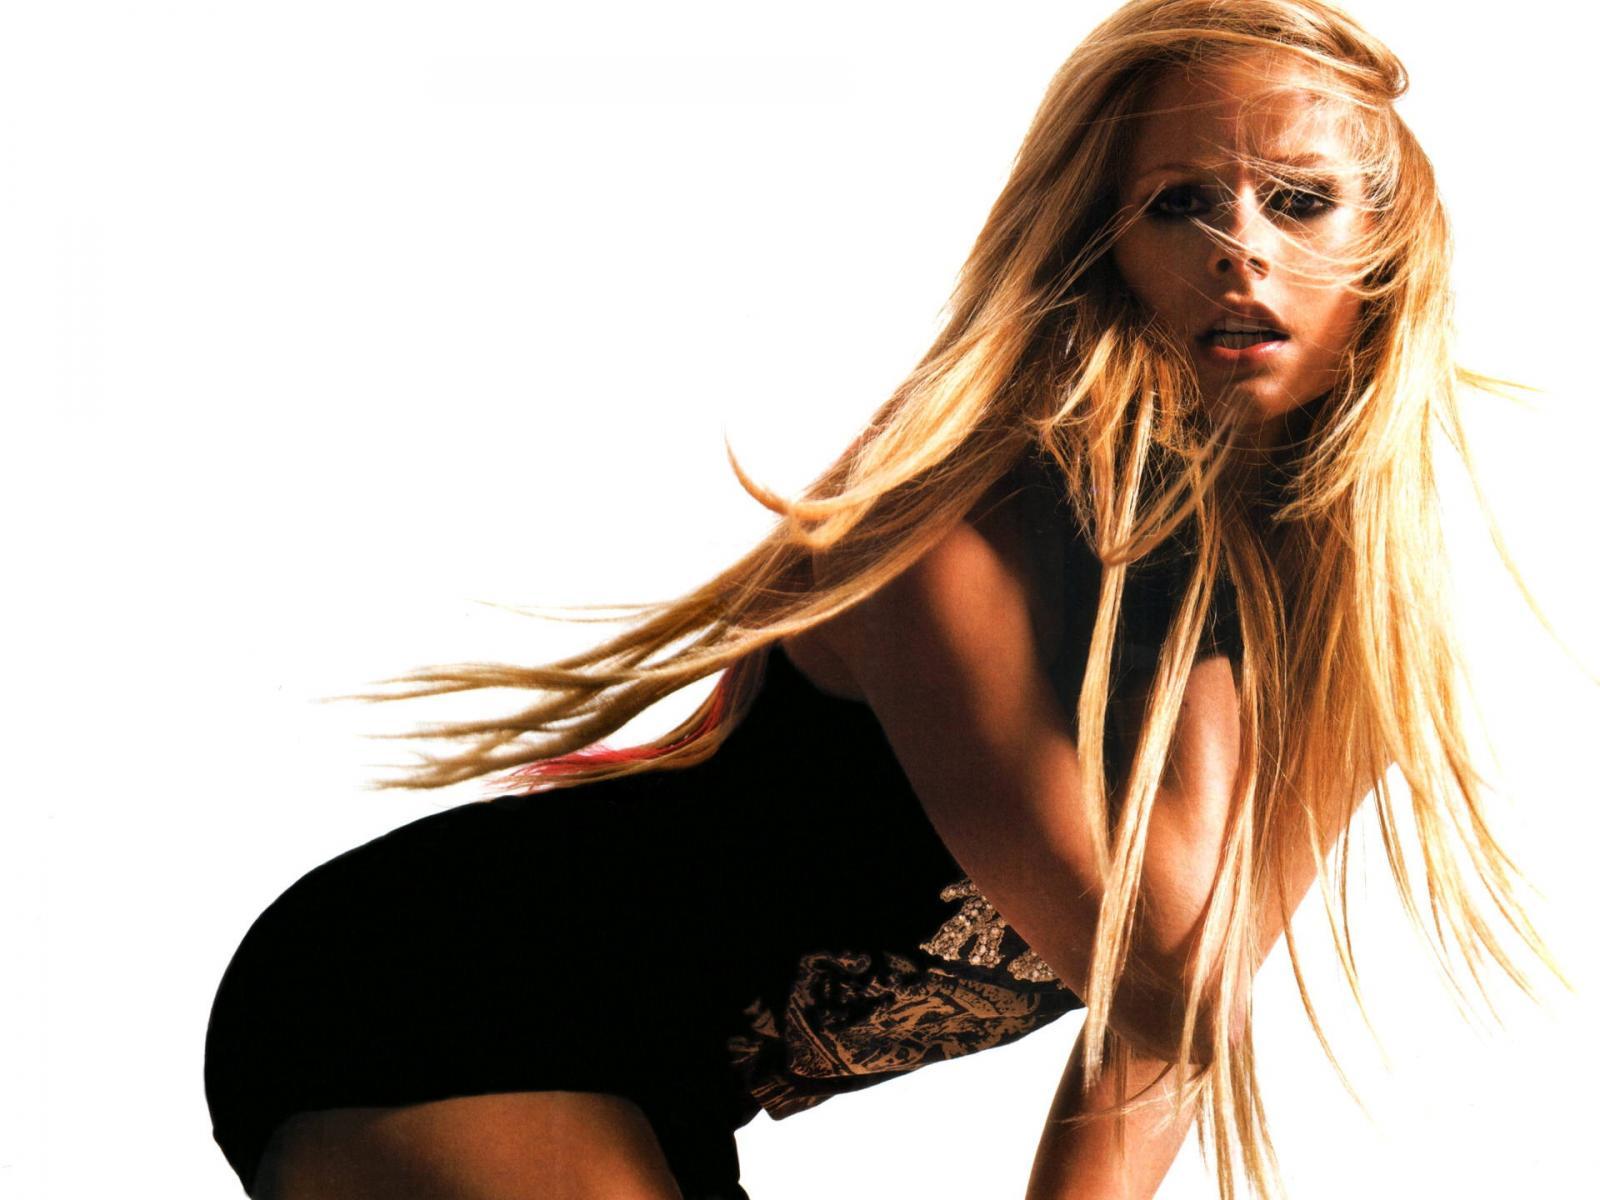 http://1.bp.blogspot.com/-H8u9FZRP_Xo/TbFsIeZbK-I/AAAAAAAAAdQ/d8qhcF8YF94/s1600/Avril+Lavigne.jpg